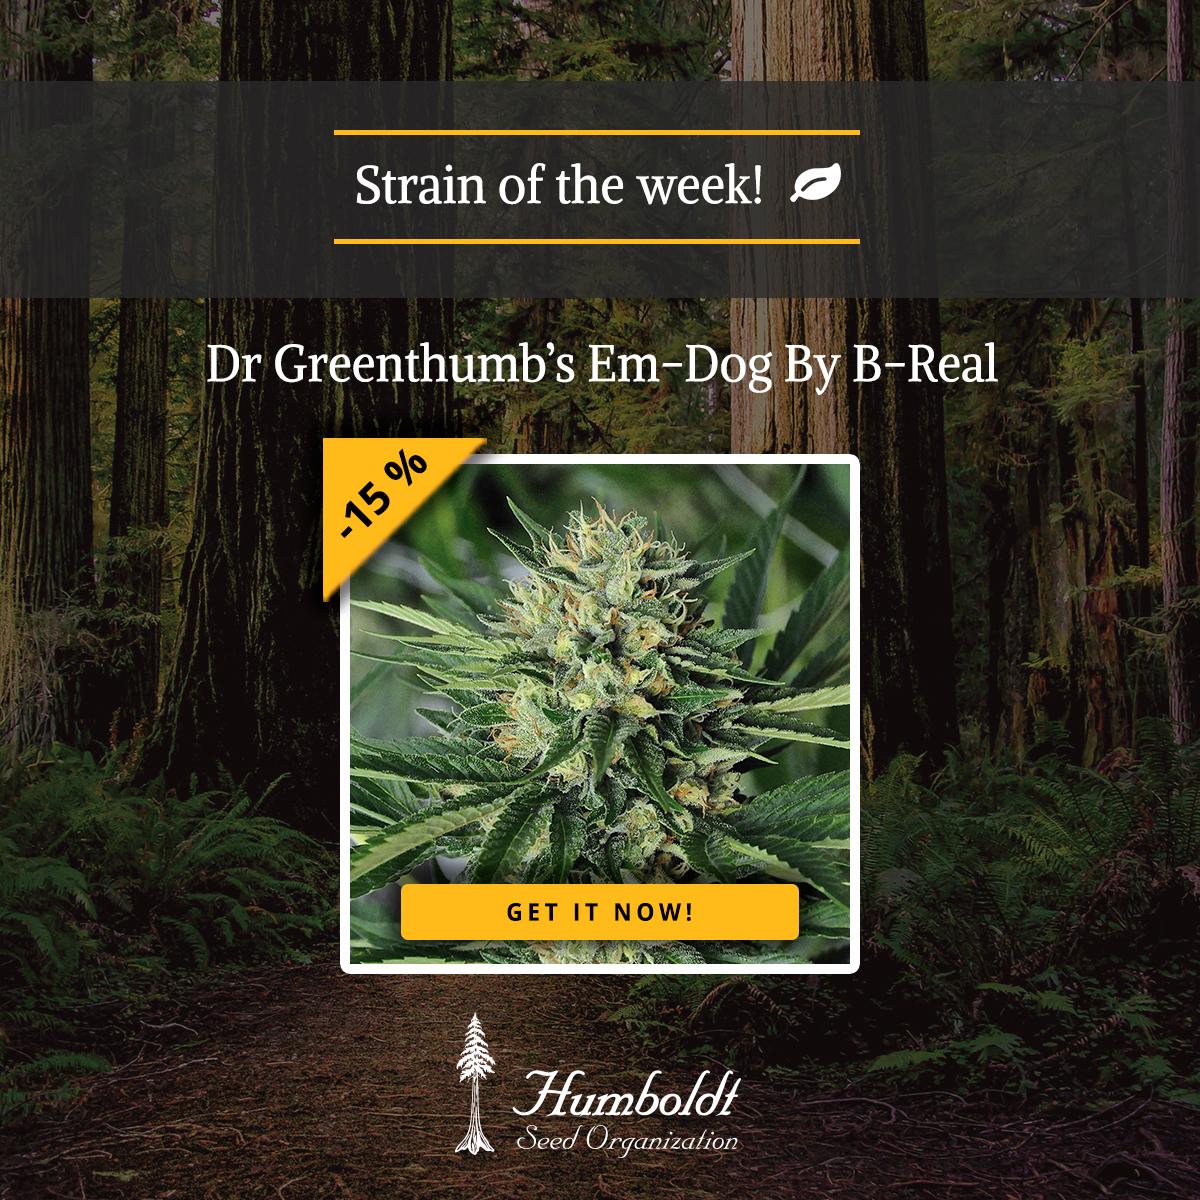 Dr Greenthumb's Em-Dog By B-Real